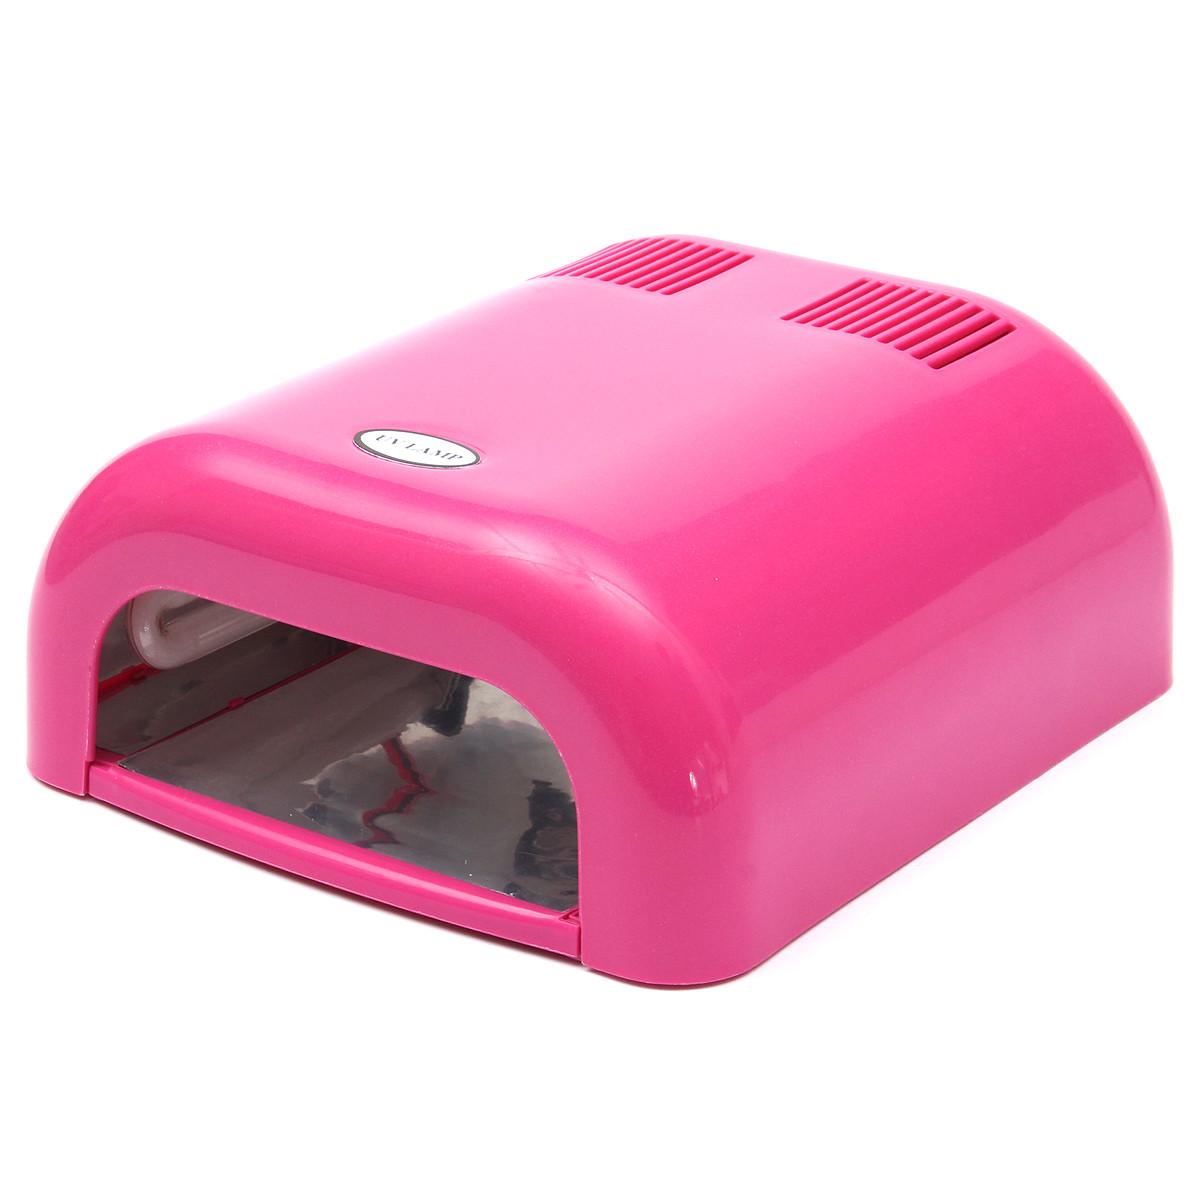 UV LED 36W Lamp Nail Dryer Polish Machine For Curing Nail